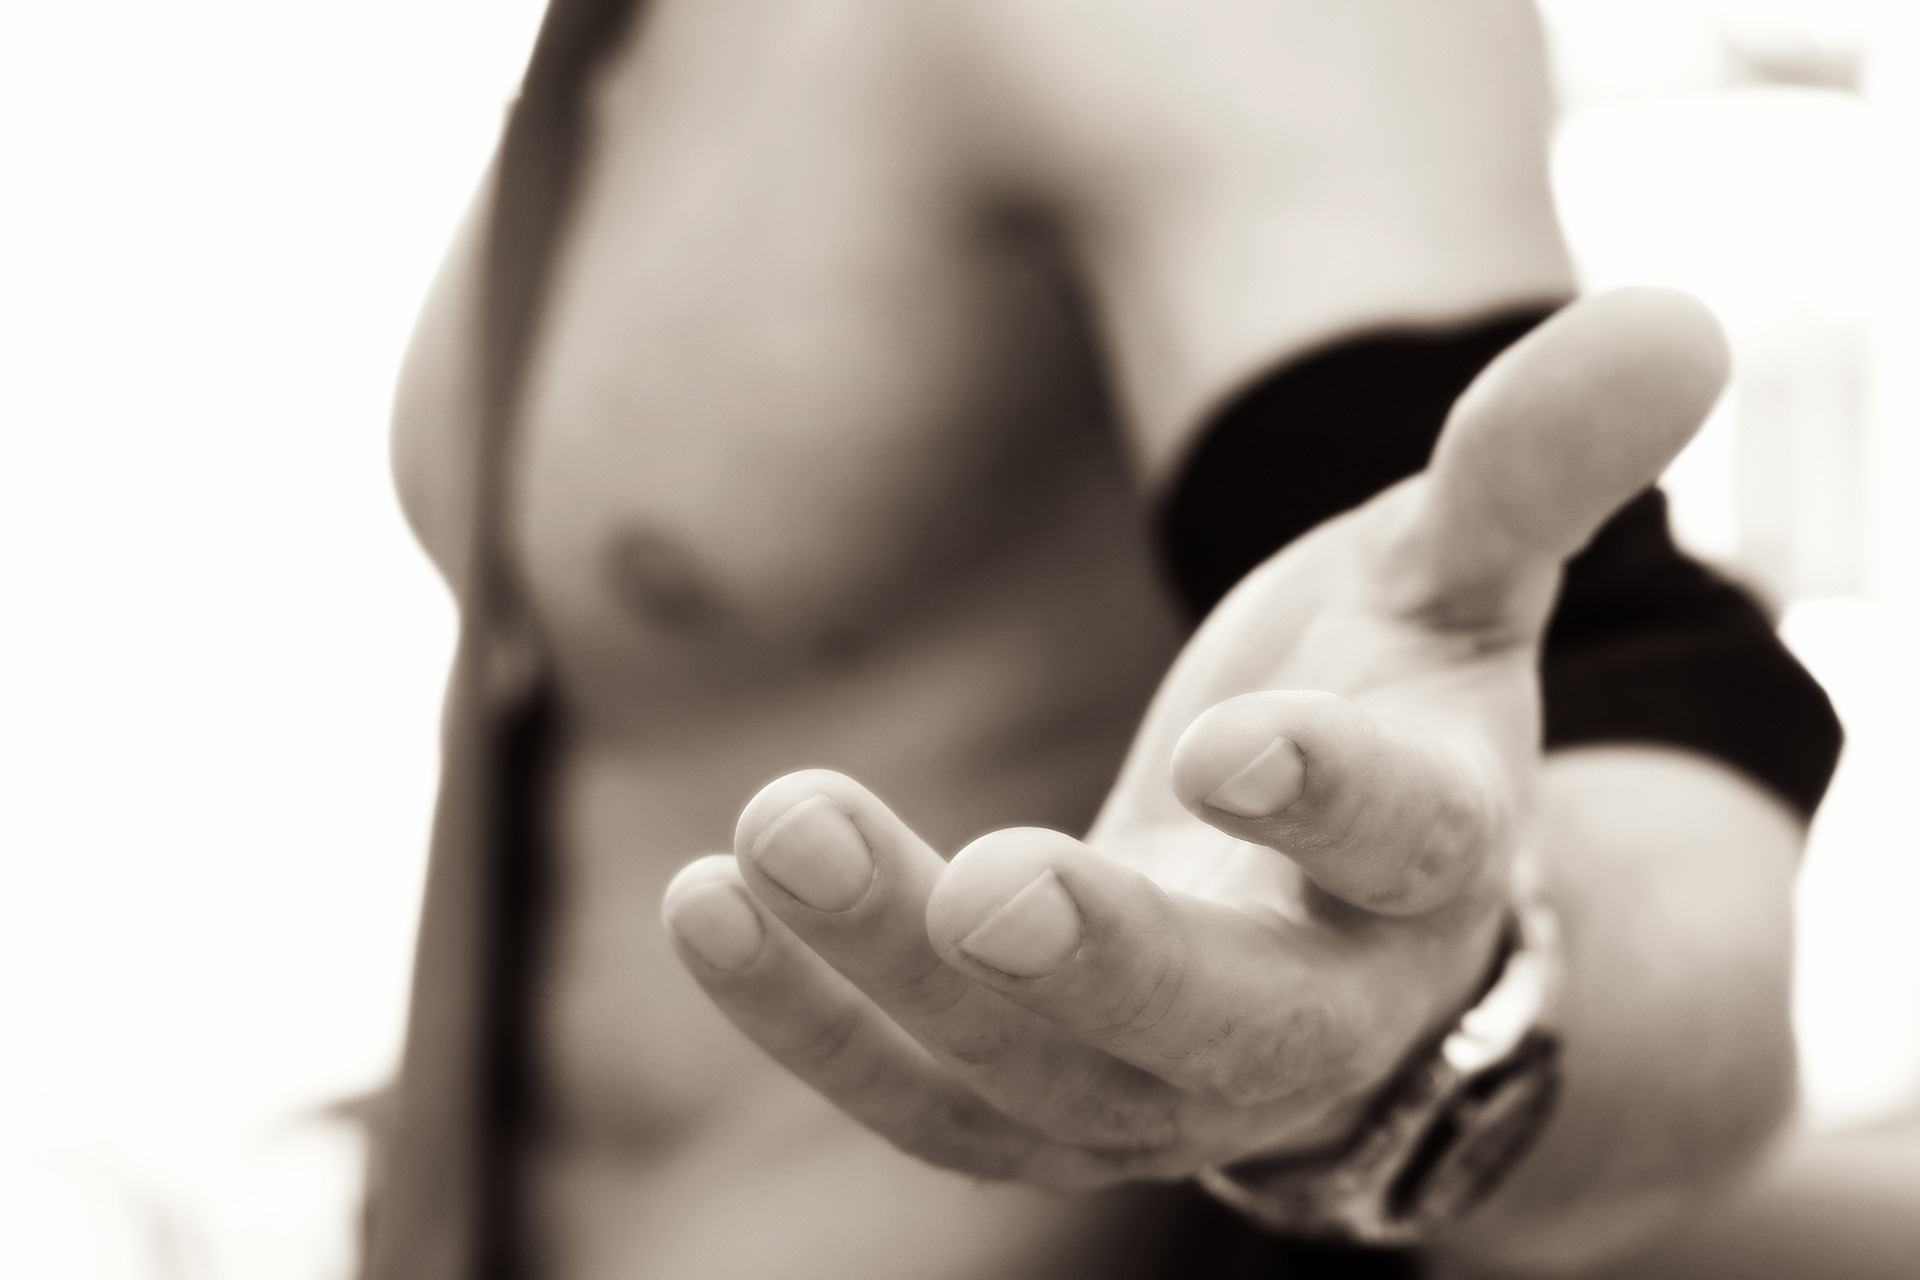 sex inselat - sfatulparintilot.ro - pixabay_com - naked-1216595_1920